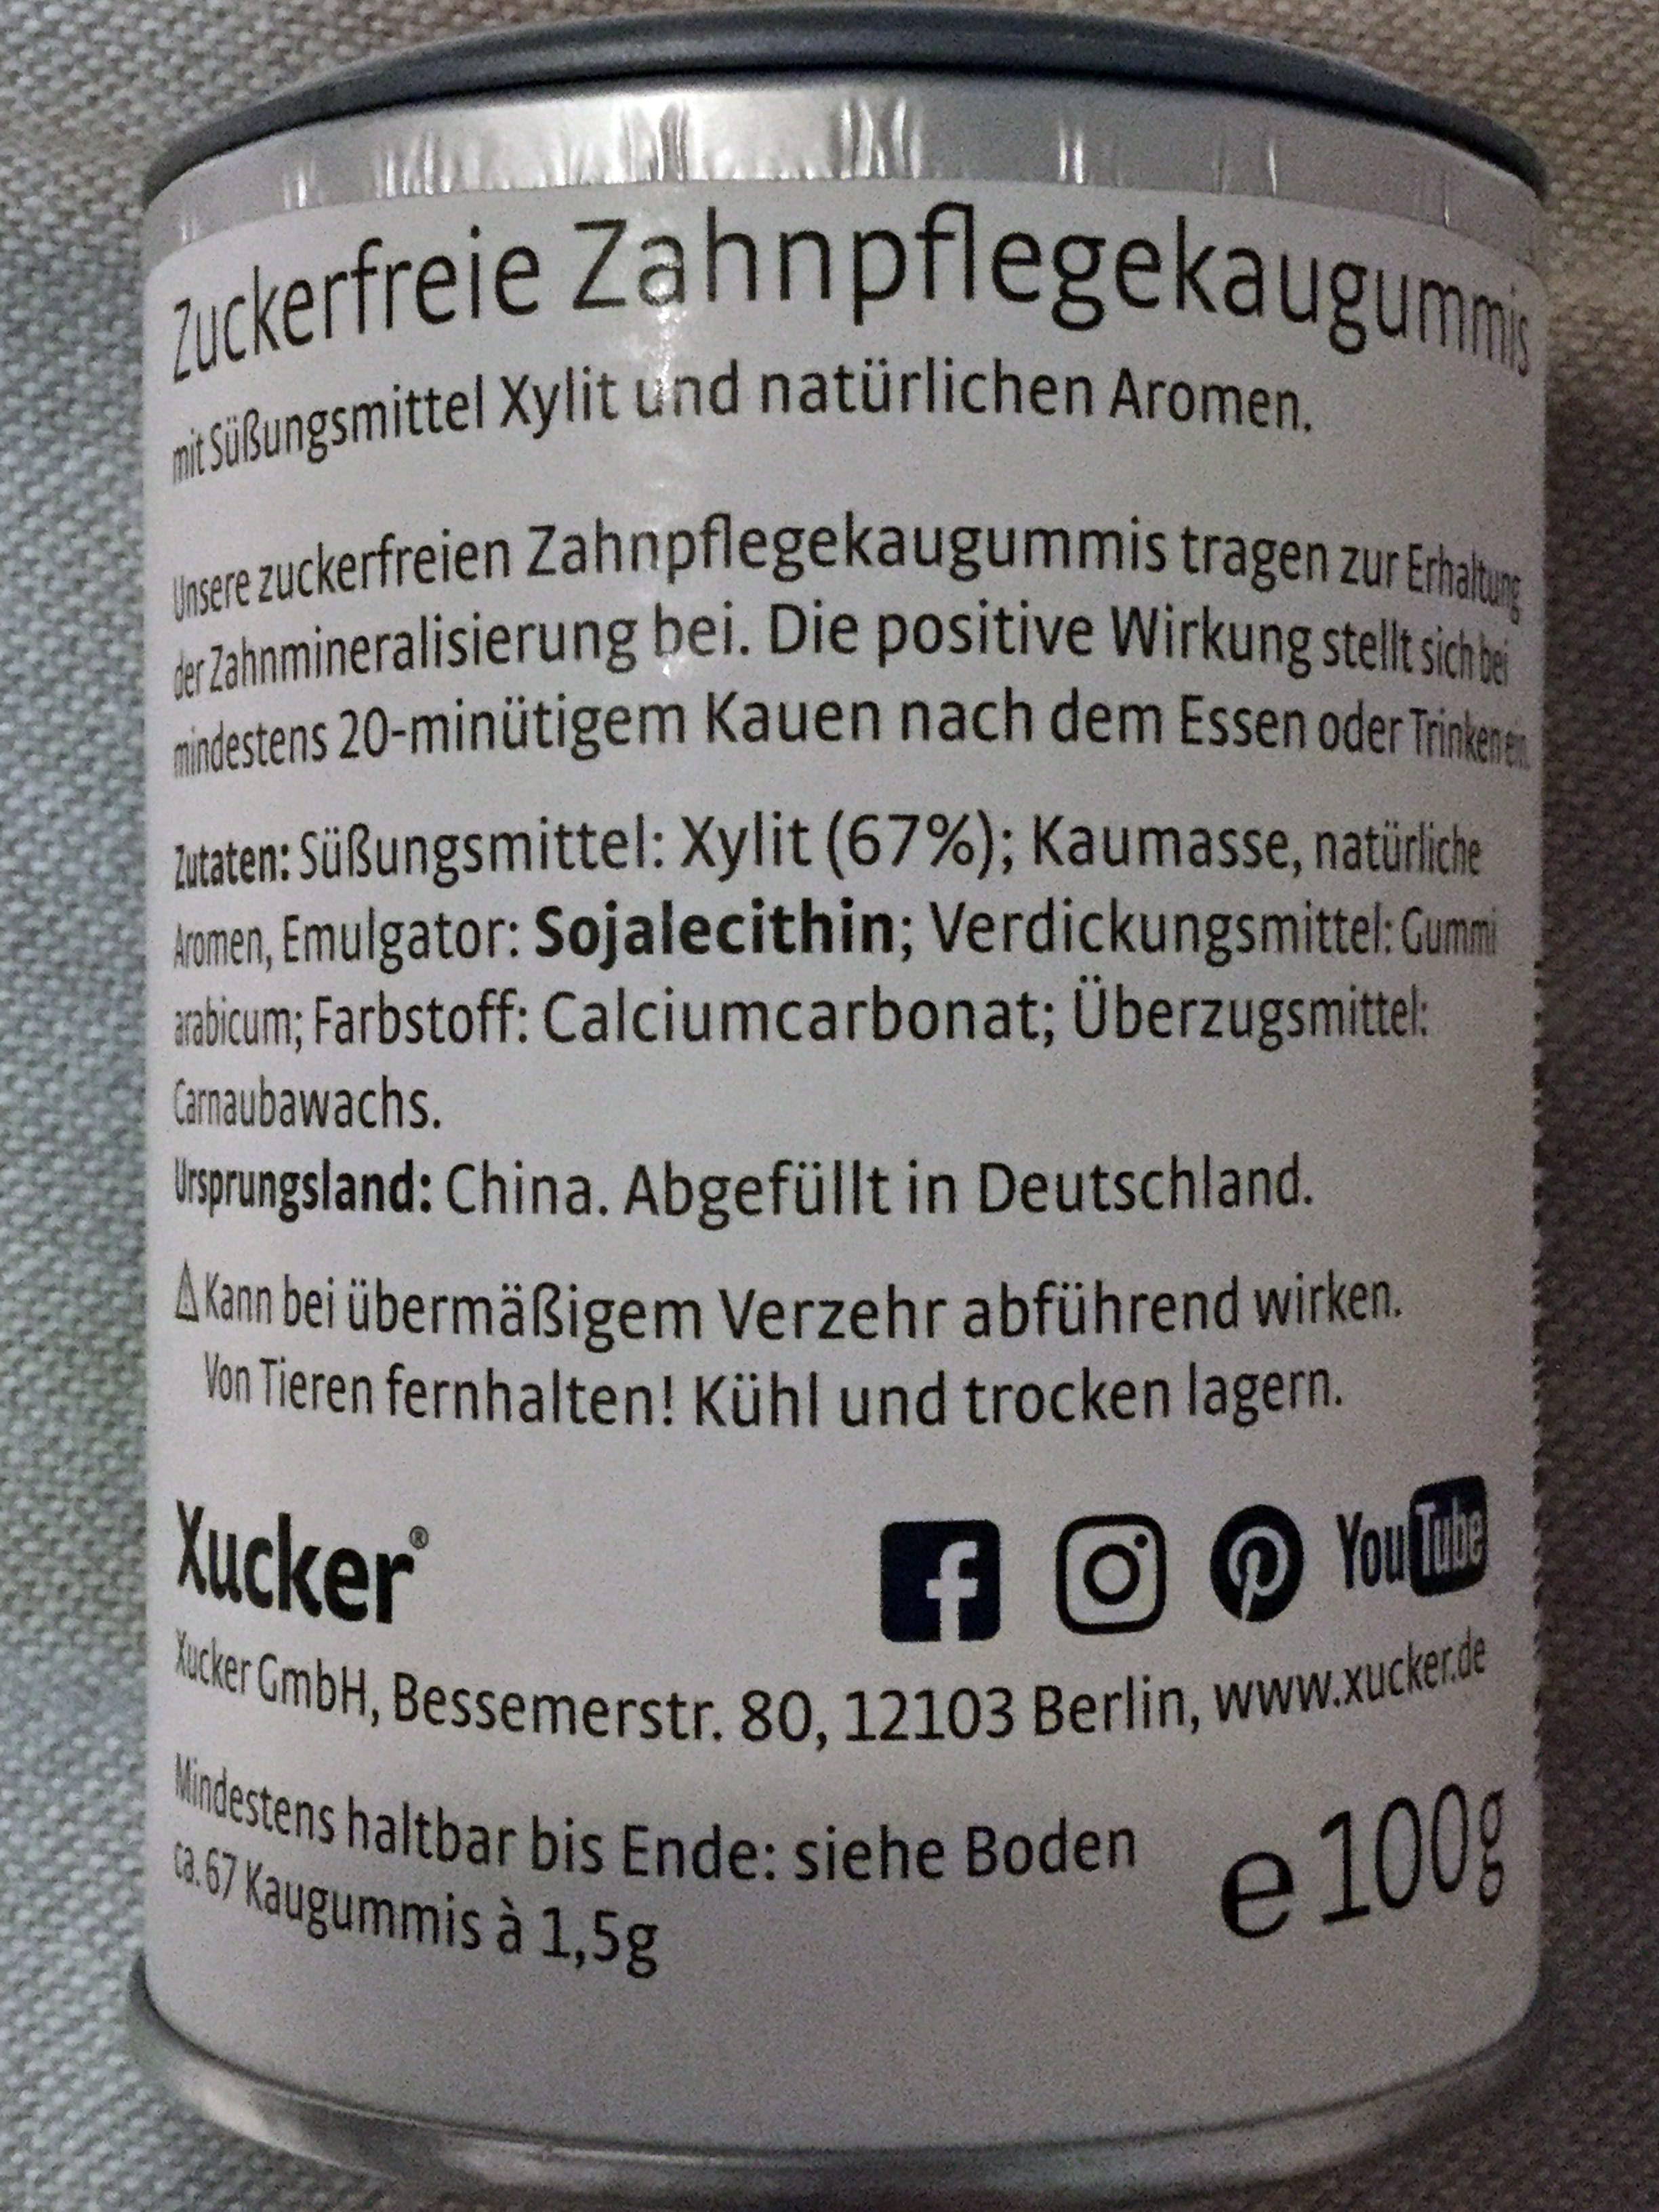 Xucker Xummi Spearmint Zuckerfrei - Zutaten - de